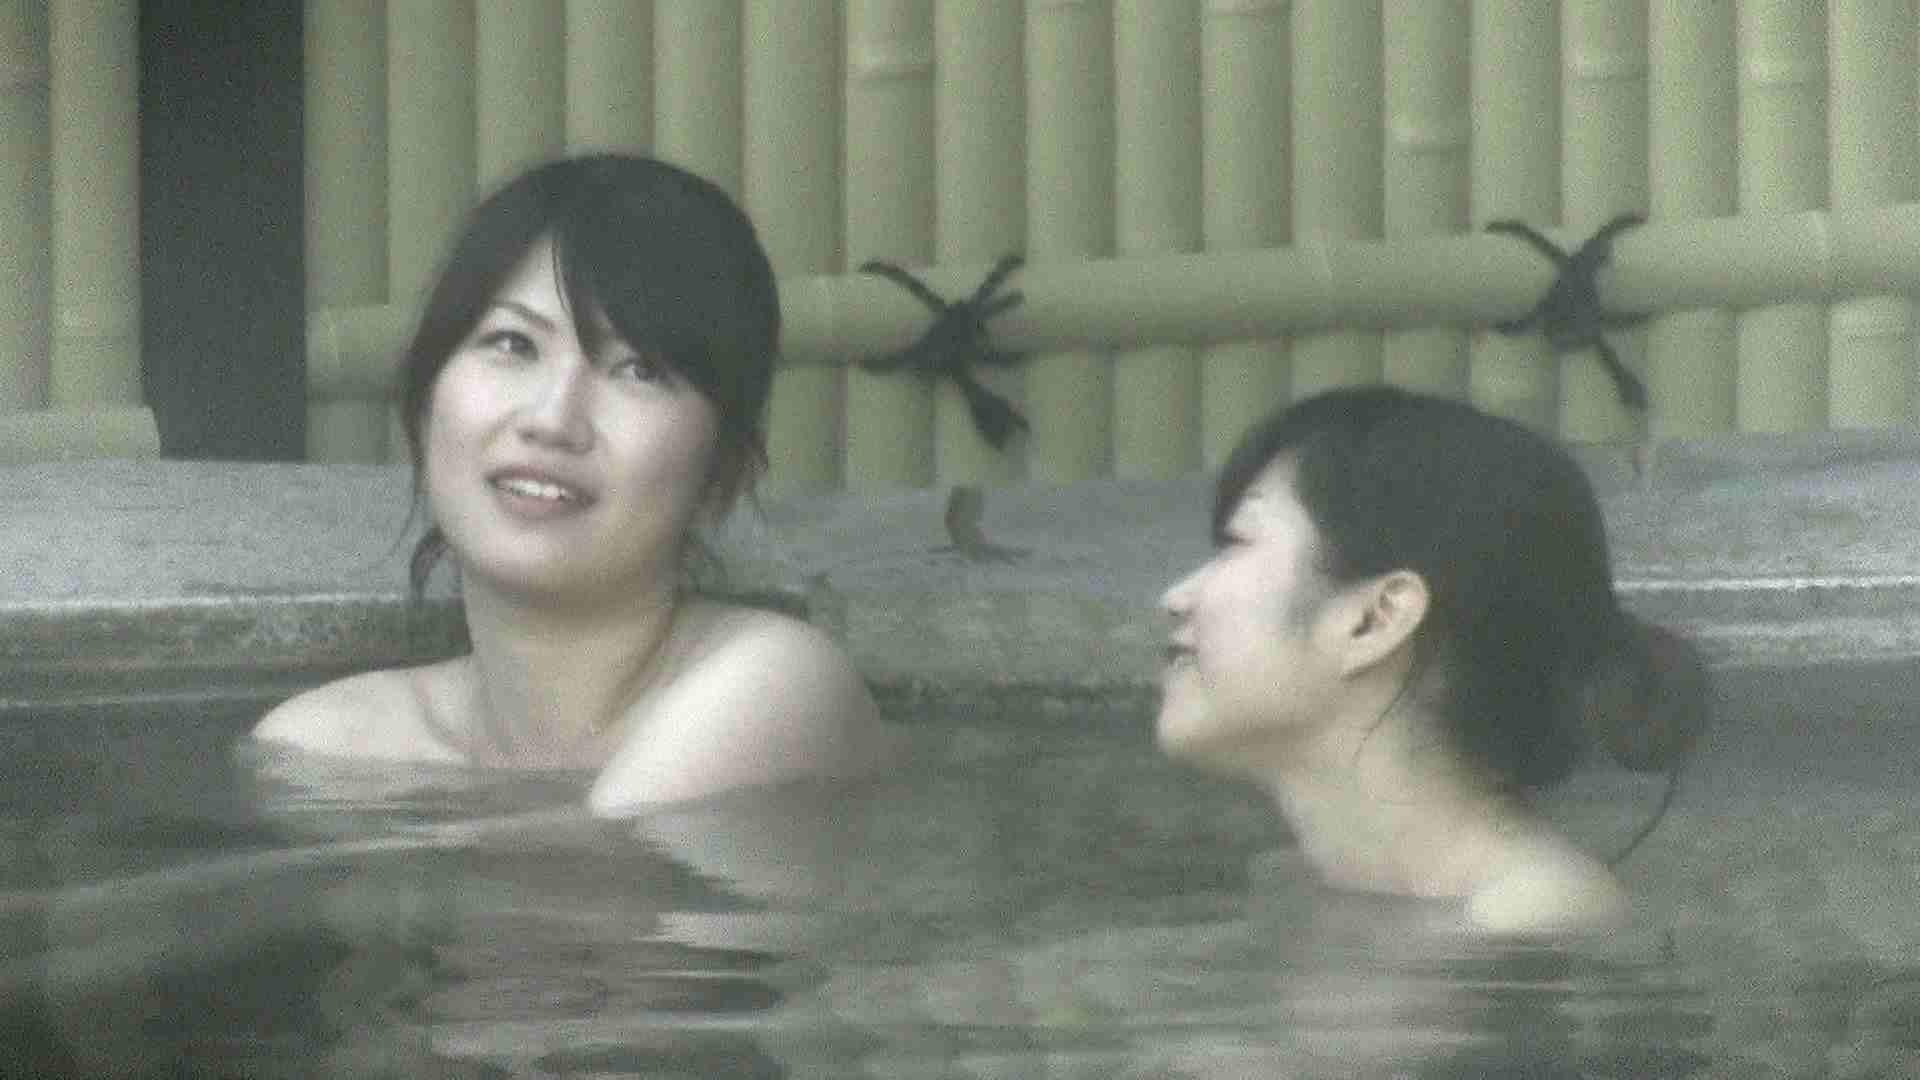 Aquaな露天風呂Vol.206 OL女体 オマンコ動画キャプチャ 80連発 5